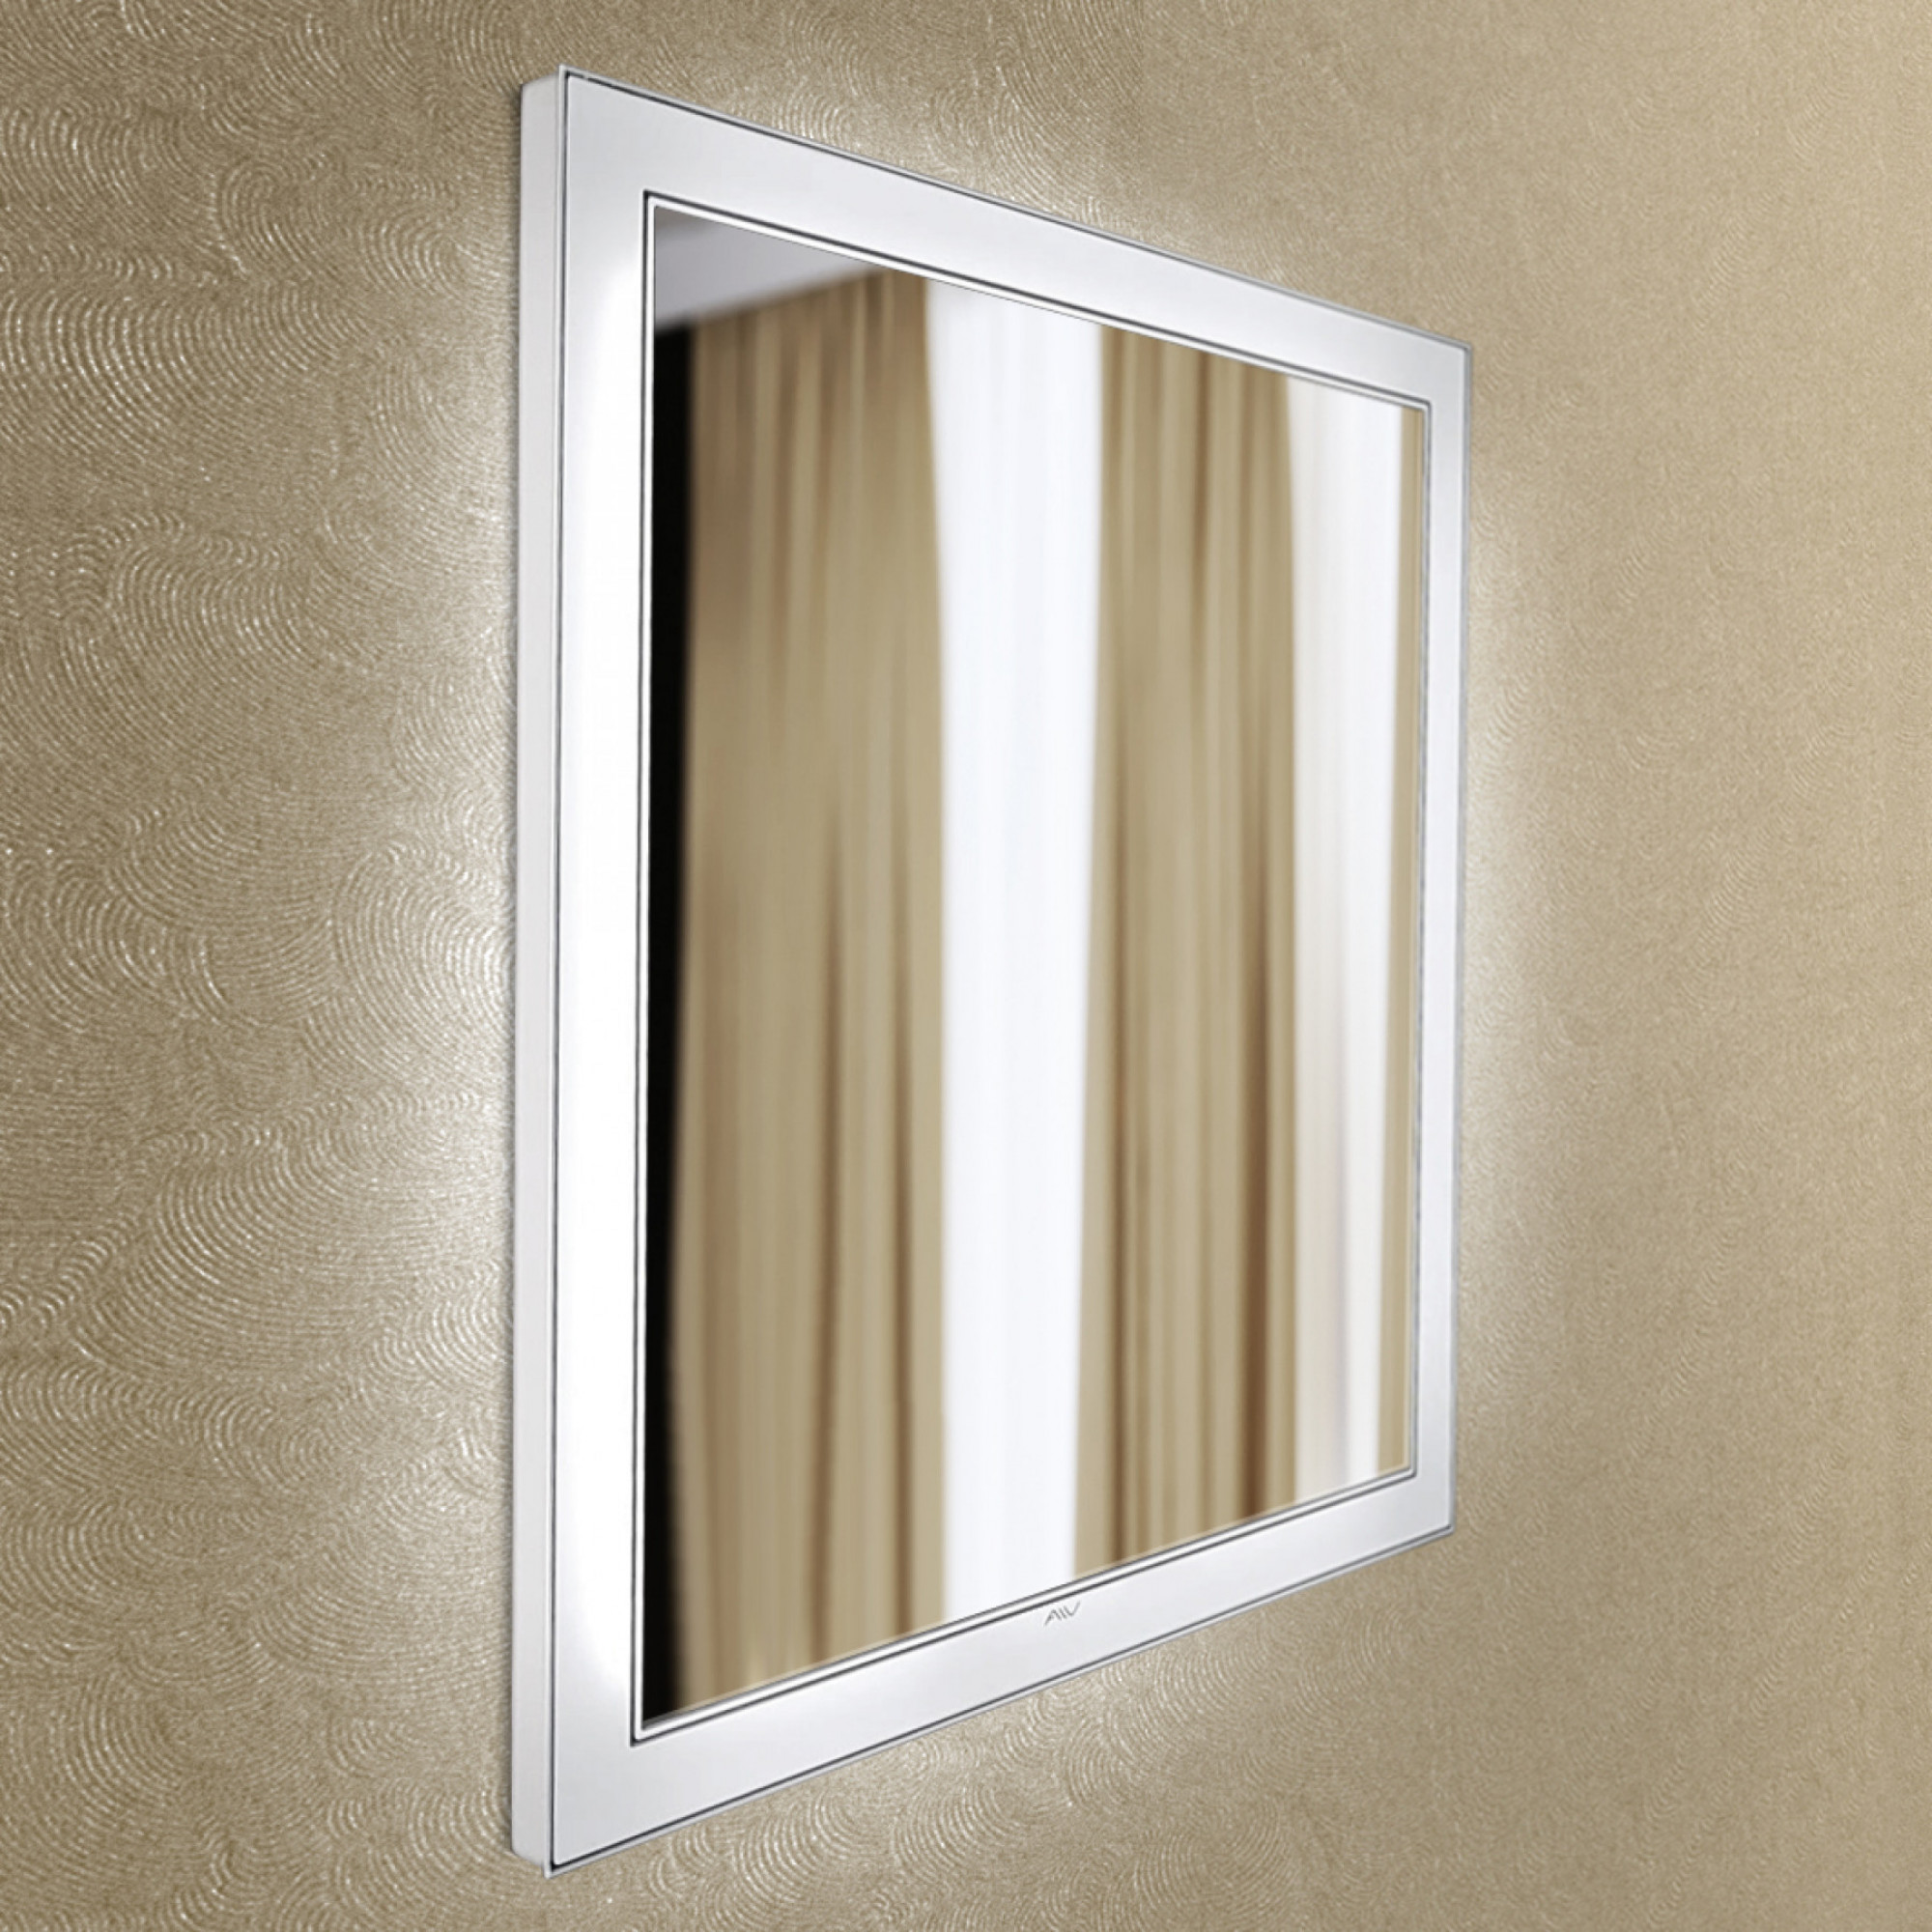 Зеркало с подсветкой Bella Lux 90